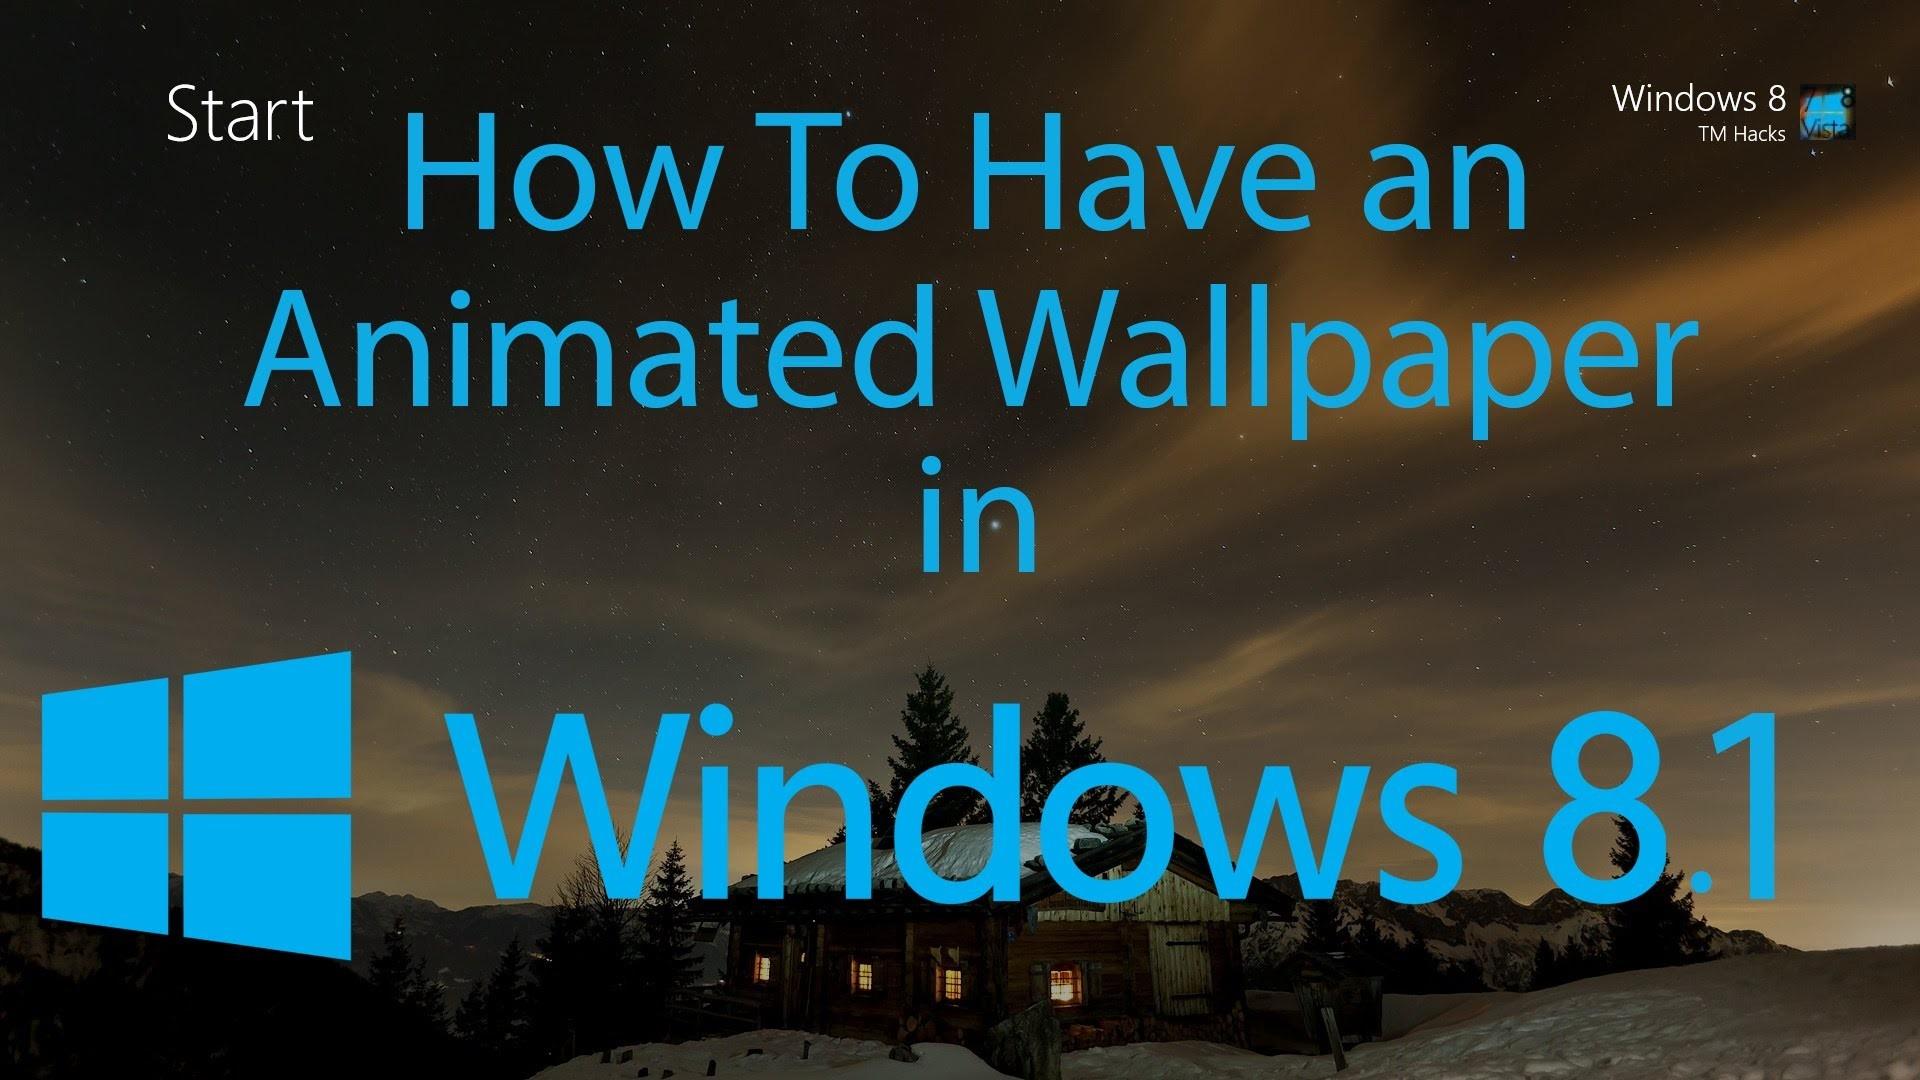 animated desktop wallpaper windows 7 (47+ images)